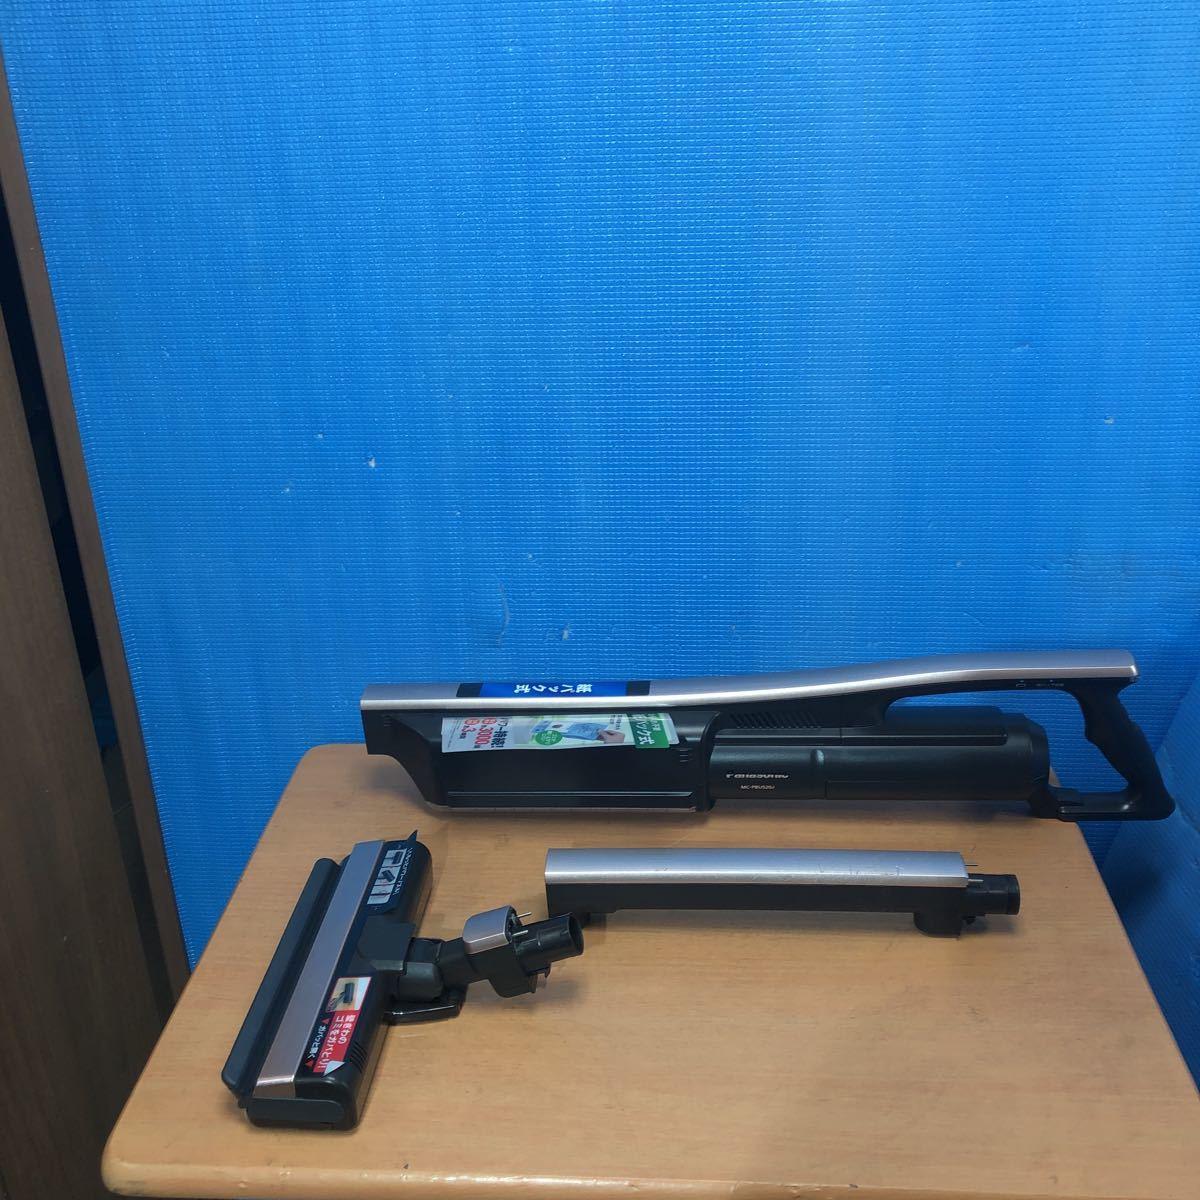 Panasonic ハウスダスト発見センサー付き 紙パック式コードレスクリーナー MC-PBU520J 店舗展示サンプル用実演機 (25)_画像2